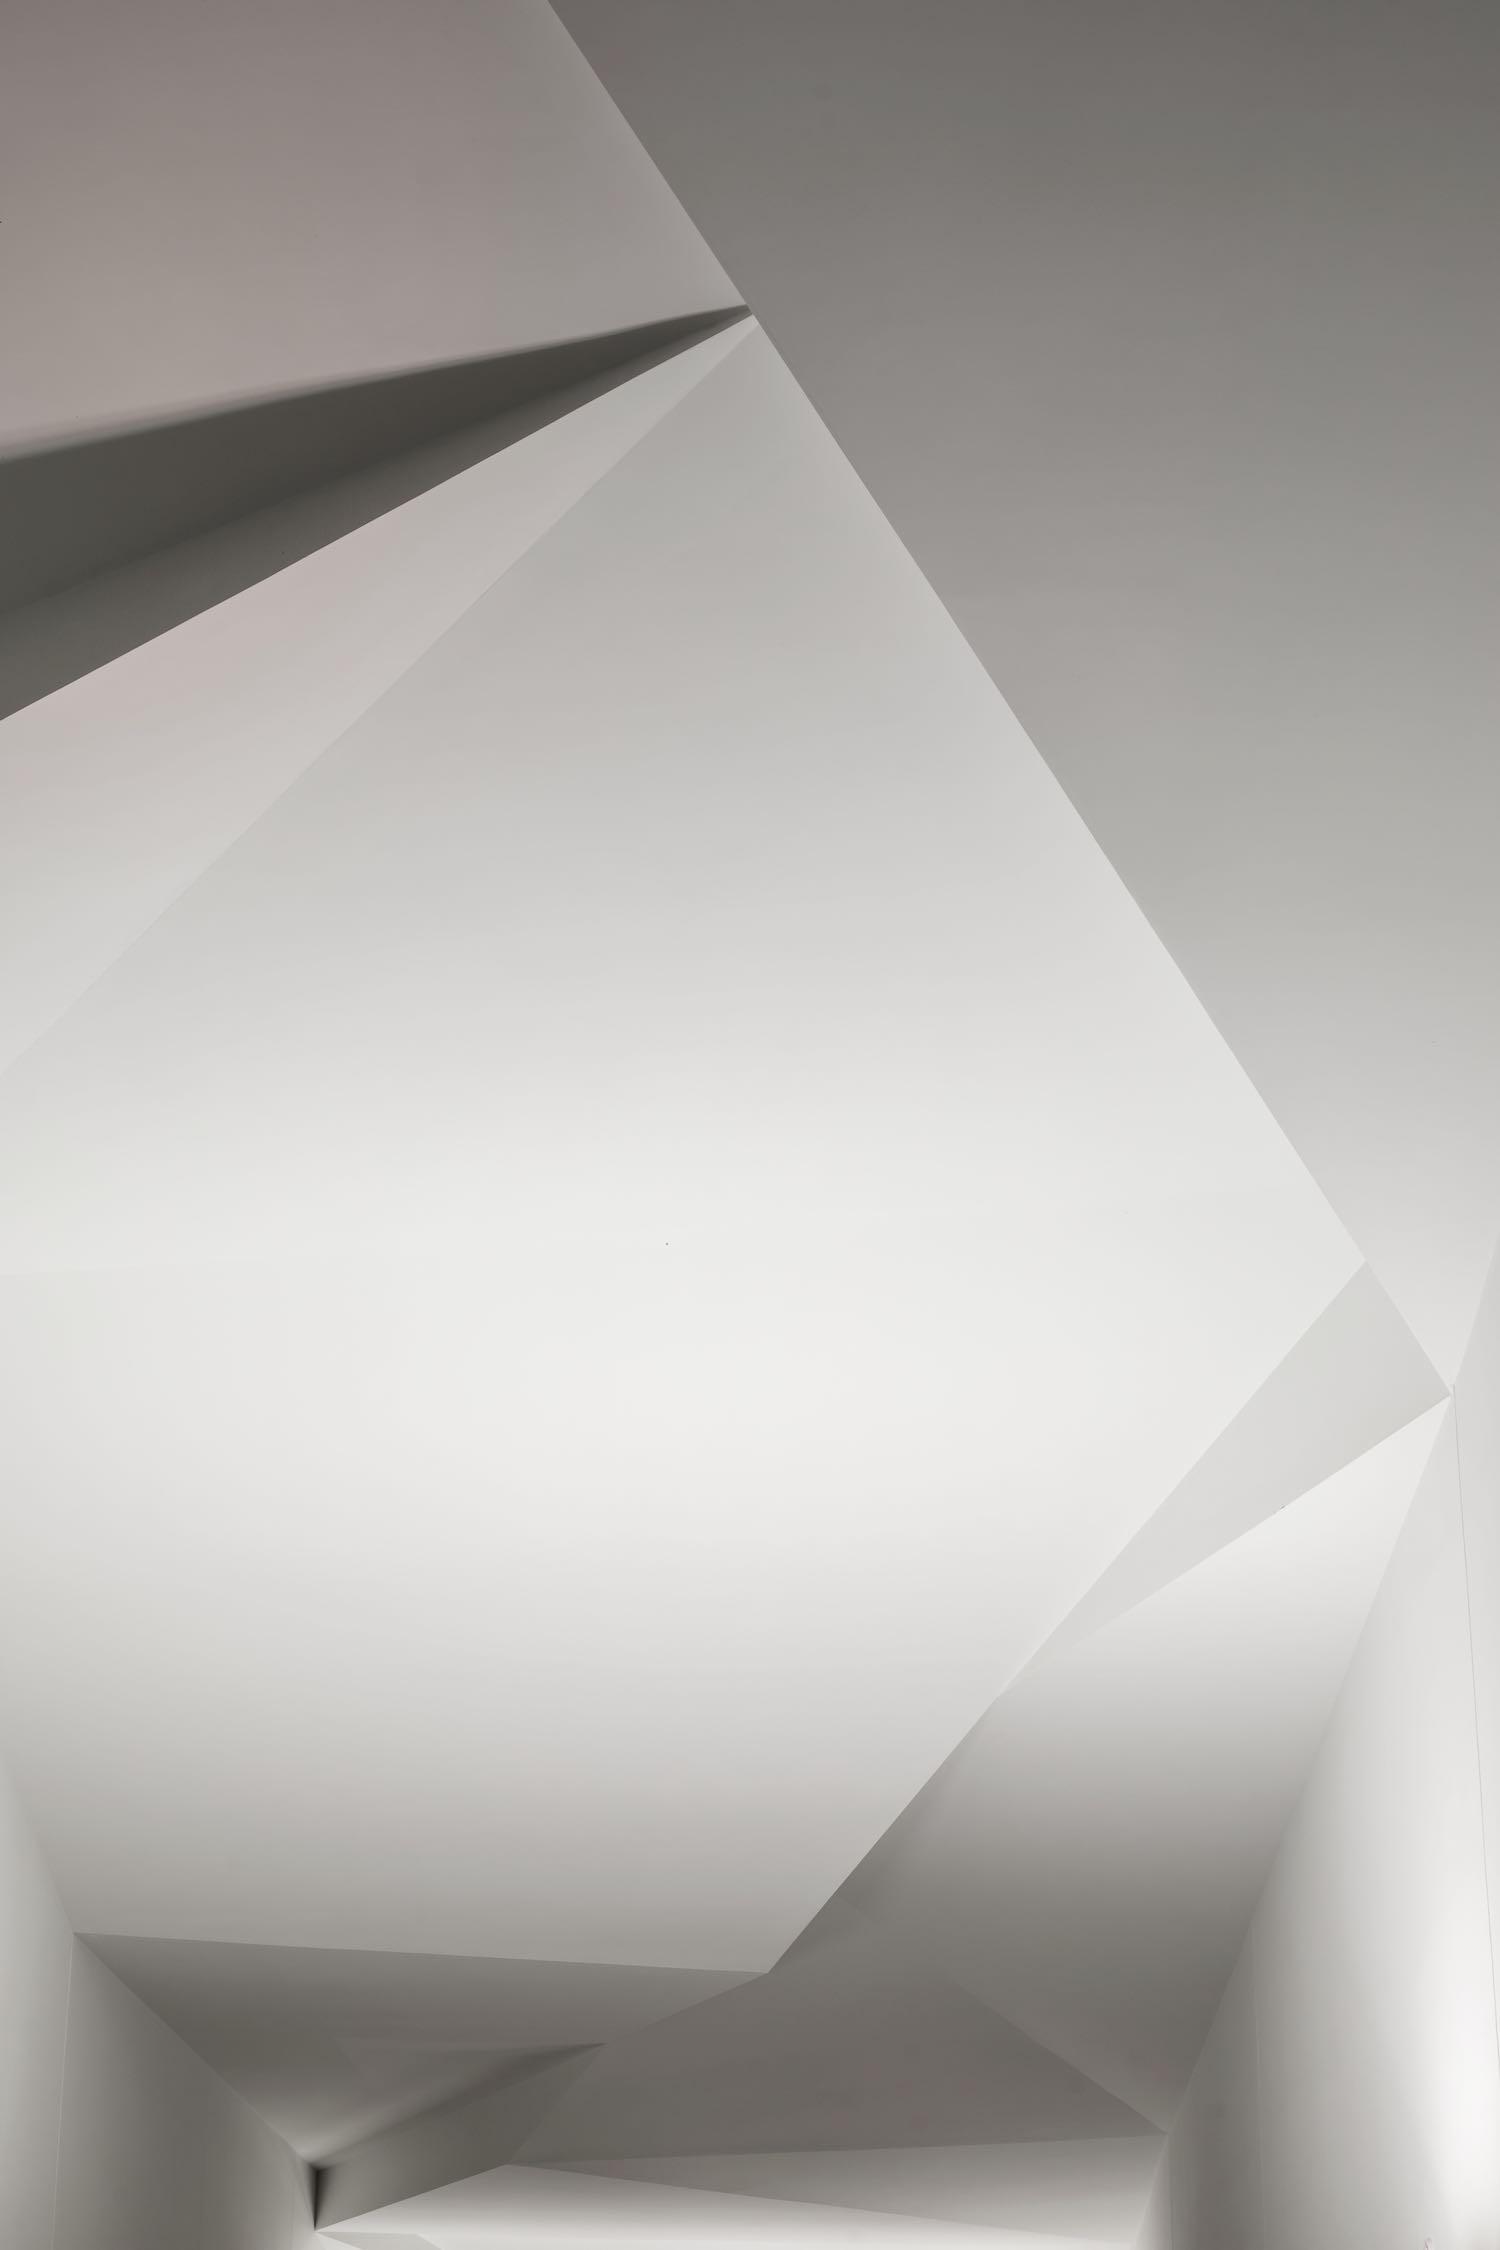 triangular white ceiling